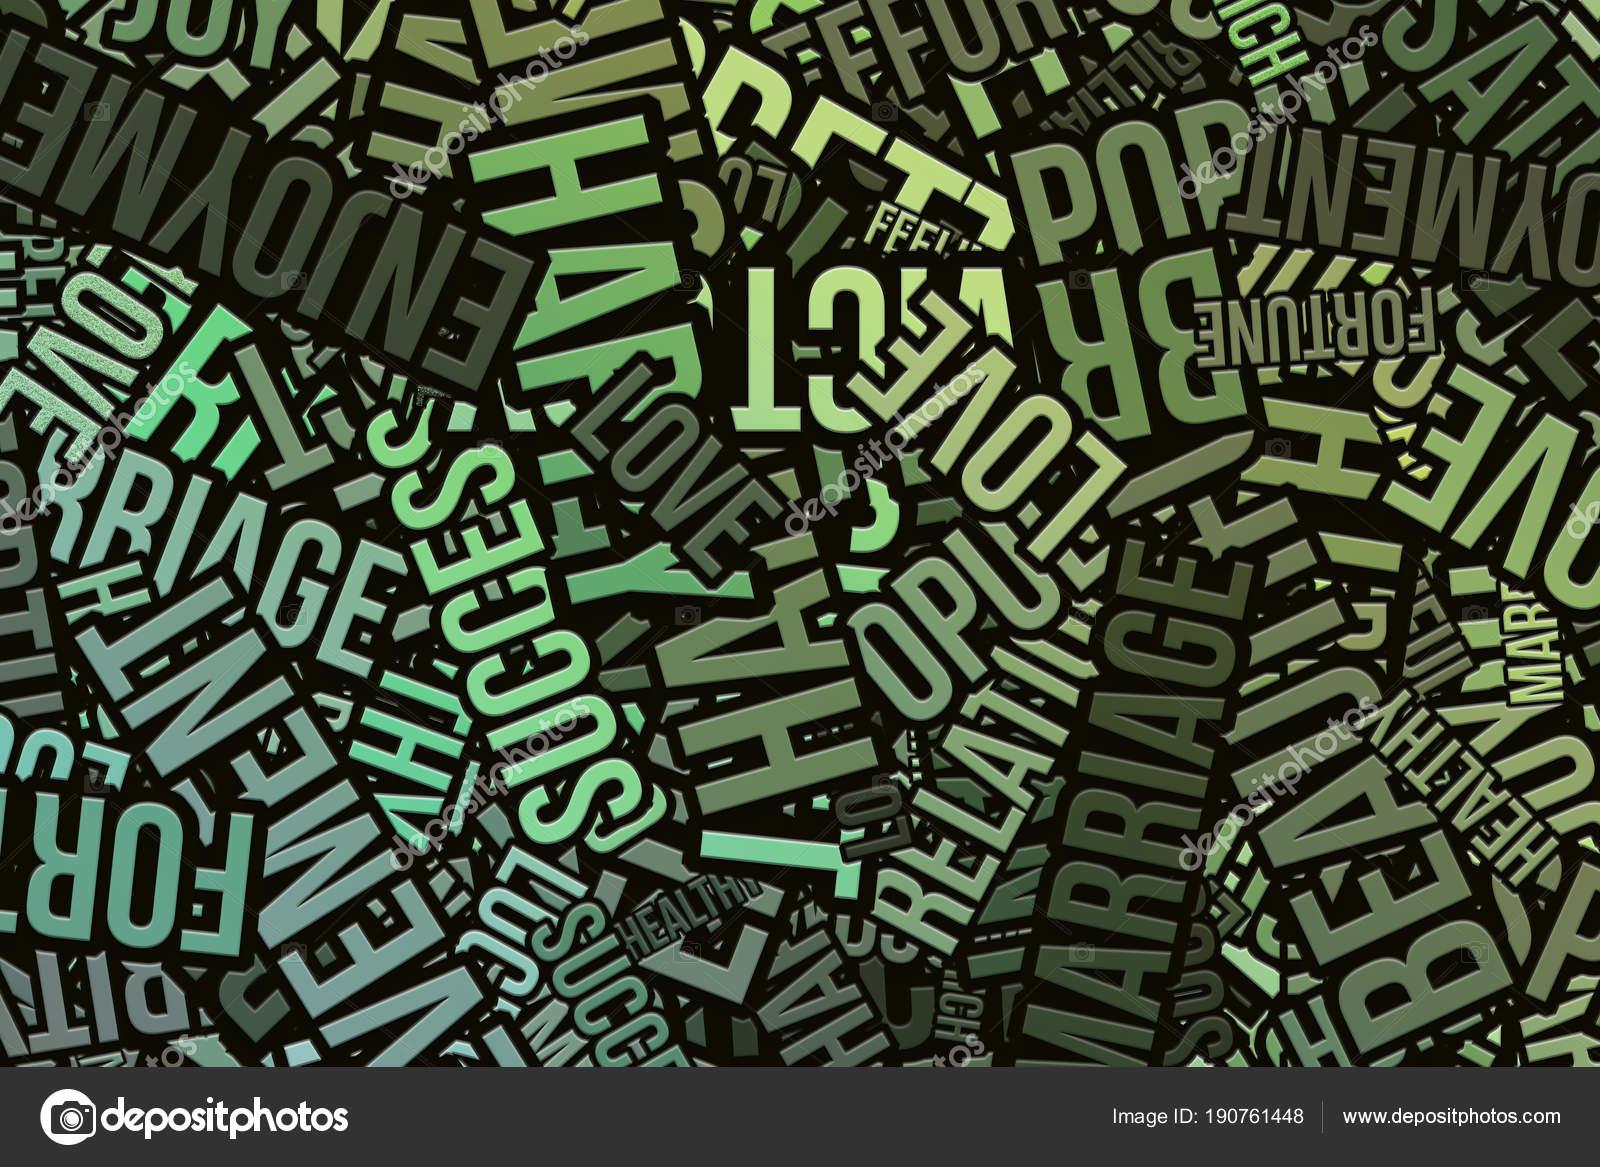 Business Words Cloud Wallpaper Or Texture Background Creativit